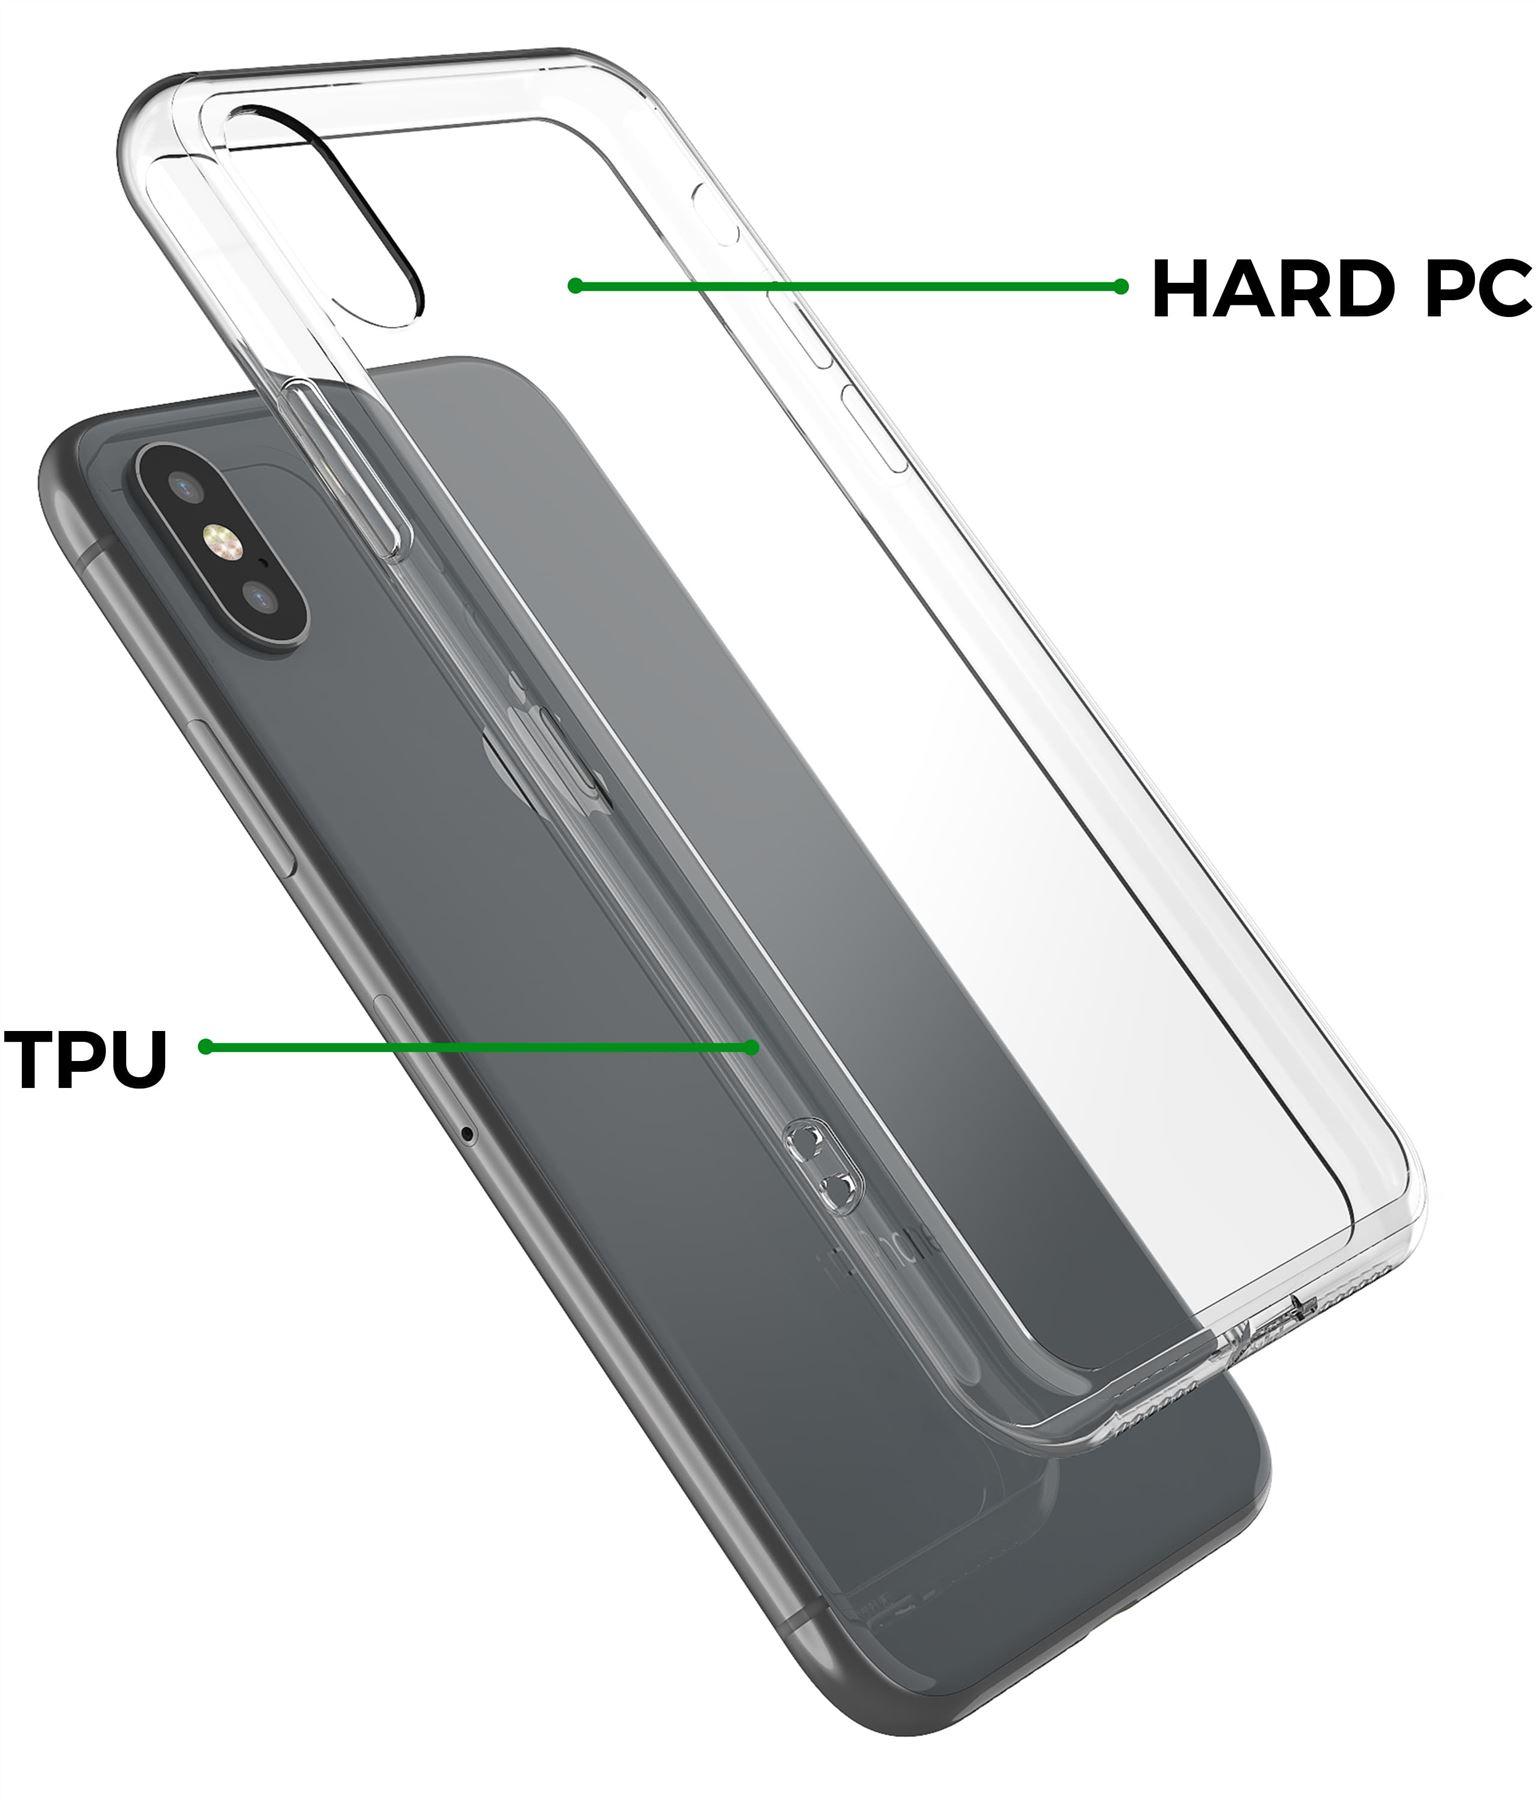 thumbnail 14 - For Apple iPhone XR Xs Max X 8 7 Plus 6 5 Se Case Cover Clear Transparent CS283